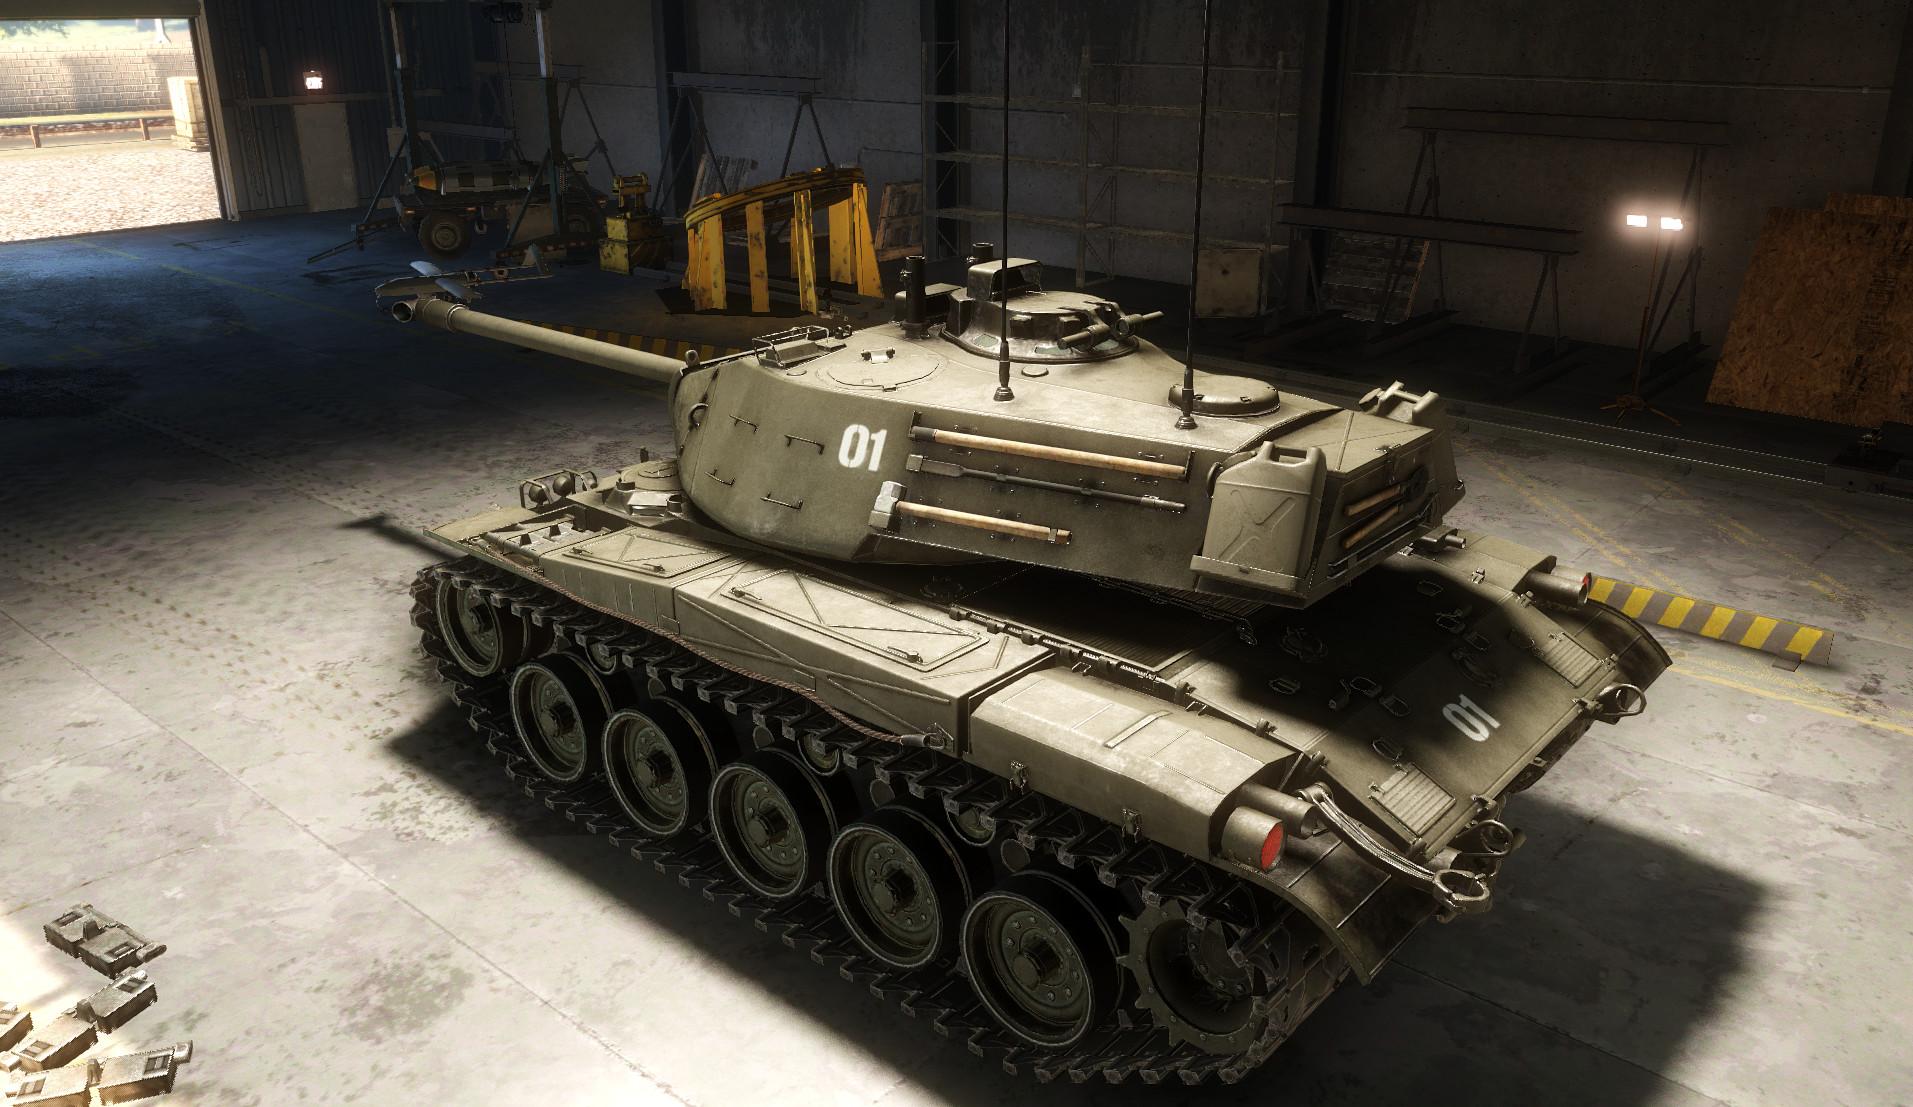 jason lewis - m41 walker bulldog light tank